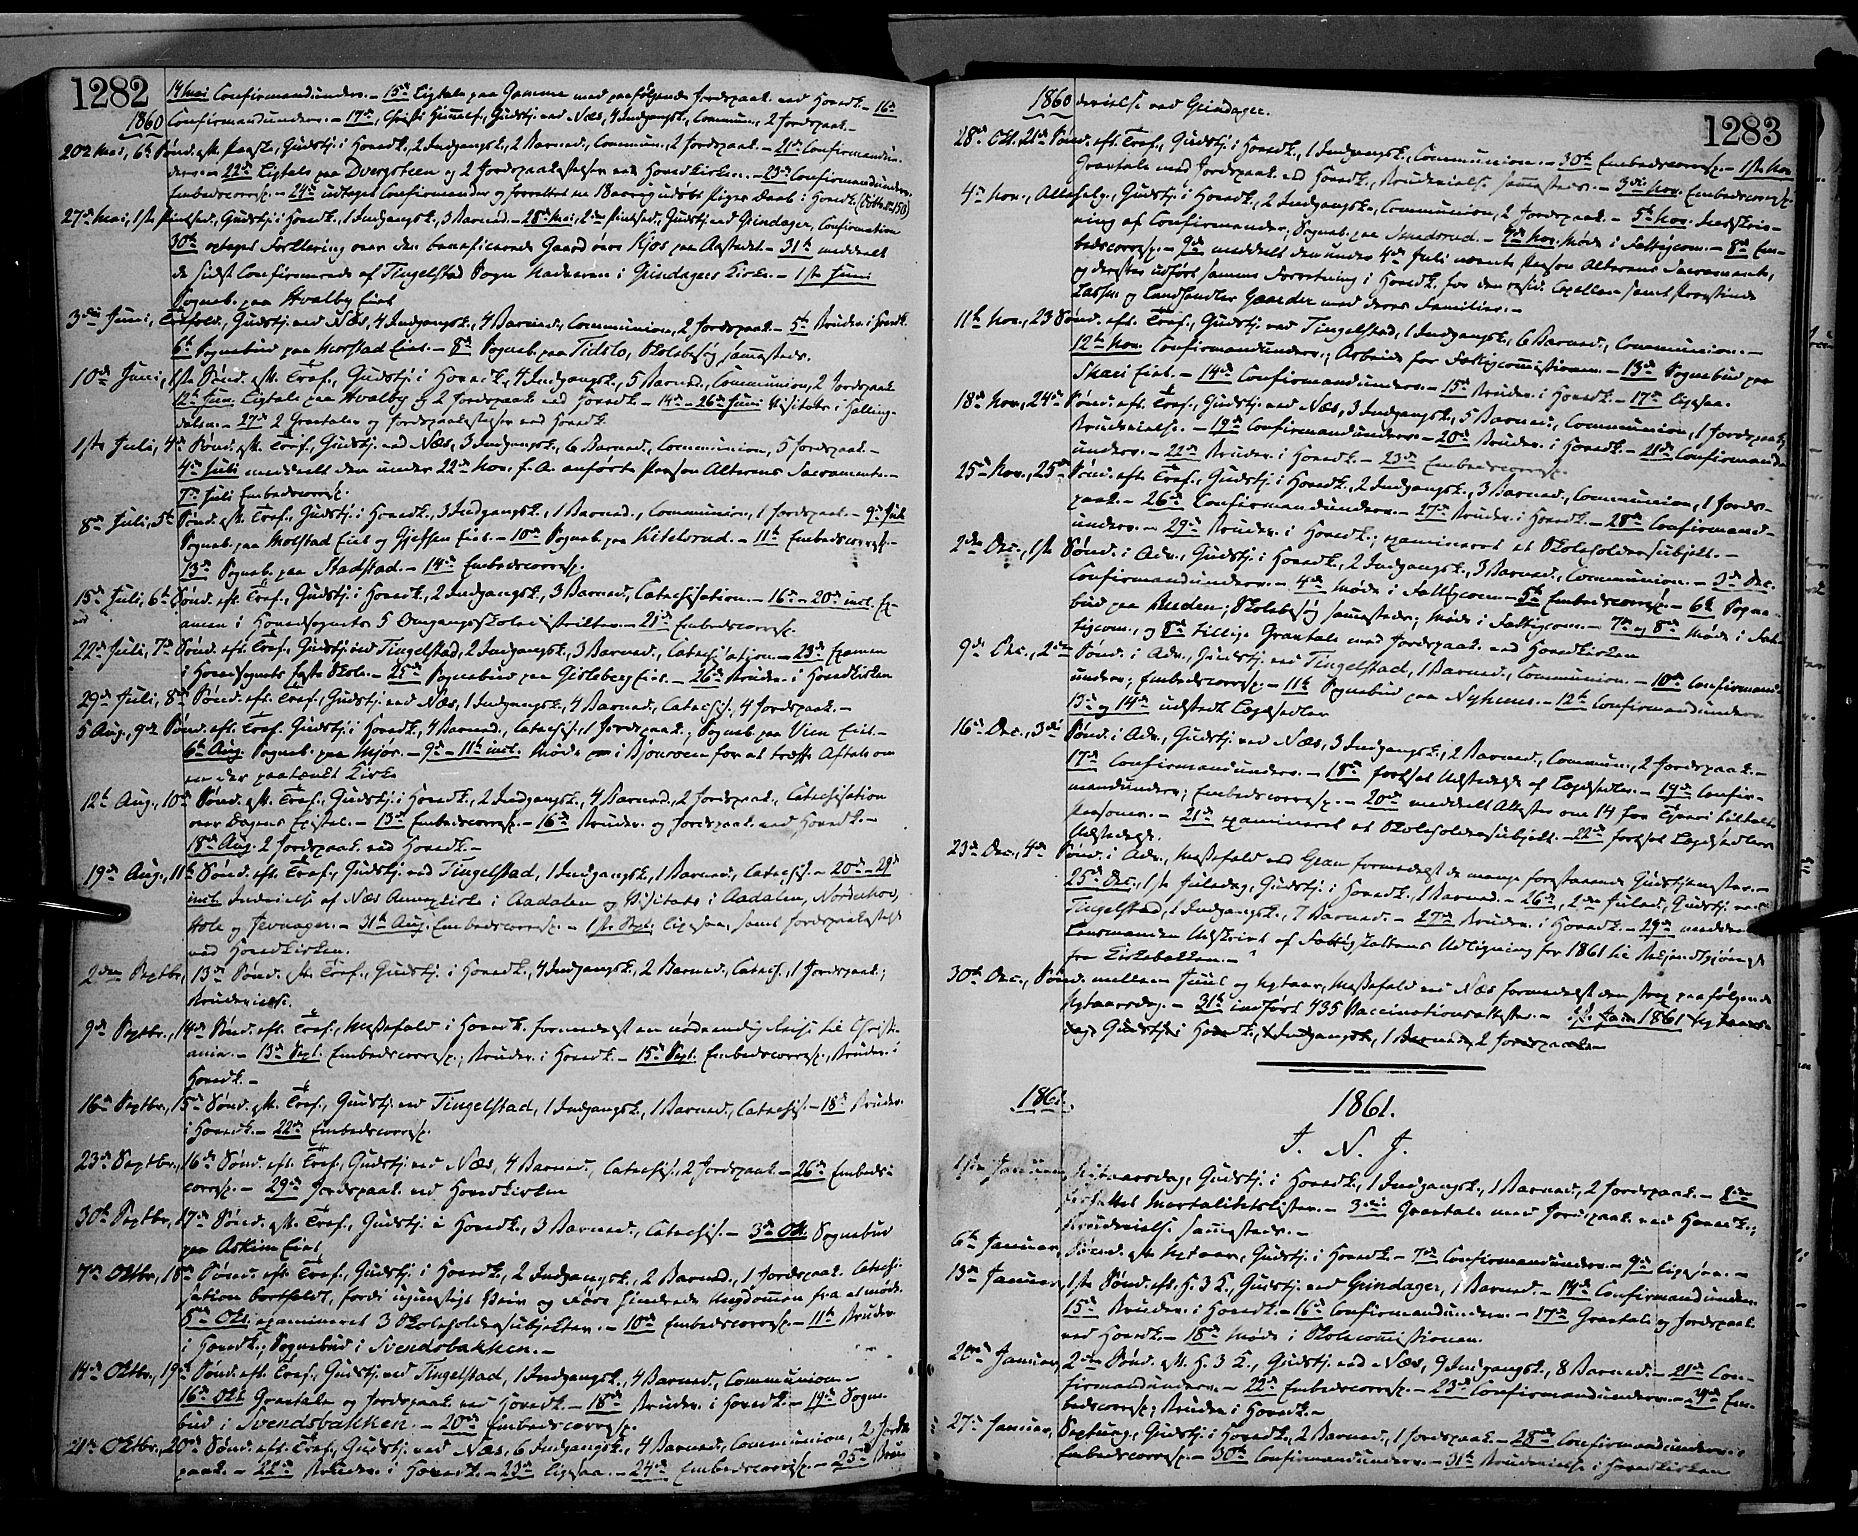 SAH, Gran prestekontor, Ministerialbok nr. 12, 1856-1874, s. 1282-1283